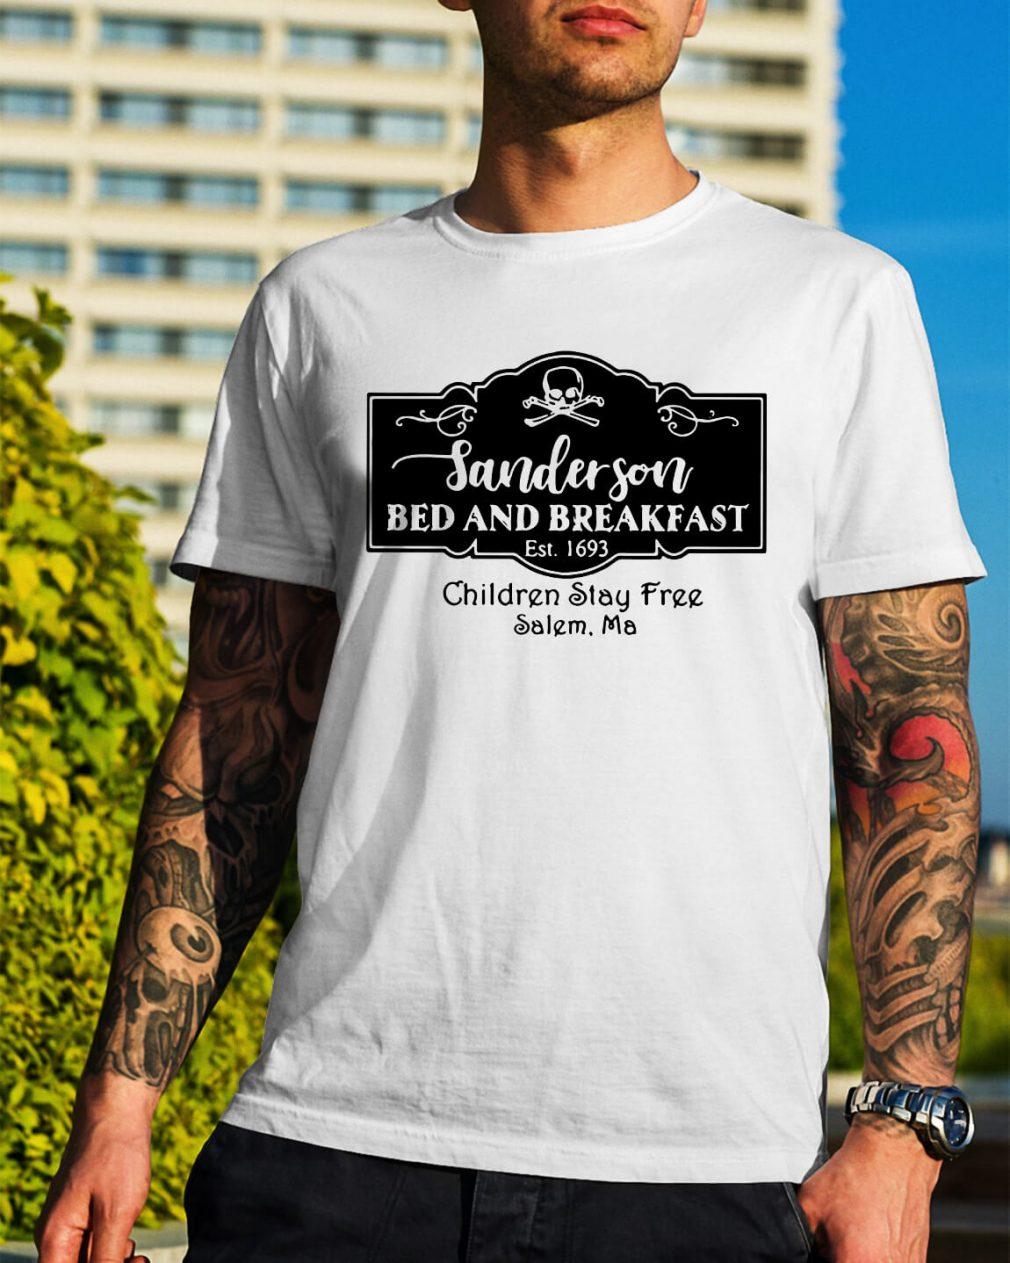 Sanderson bed and breakfast Est 1693 children stay shirt